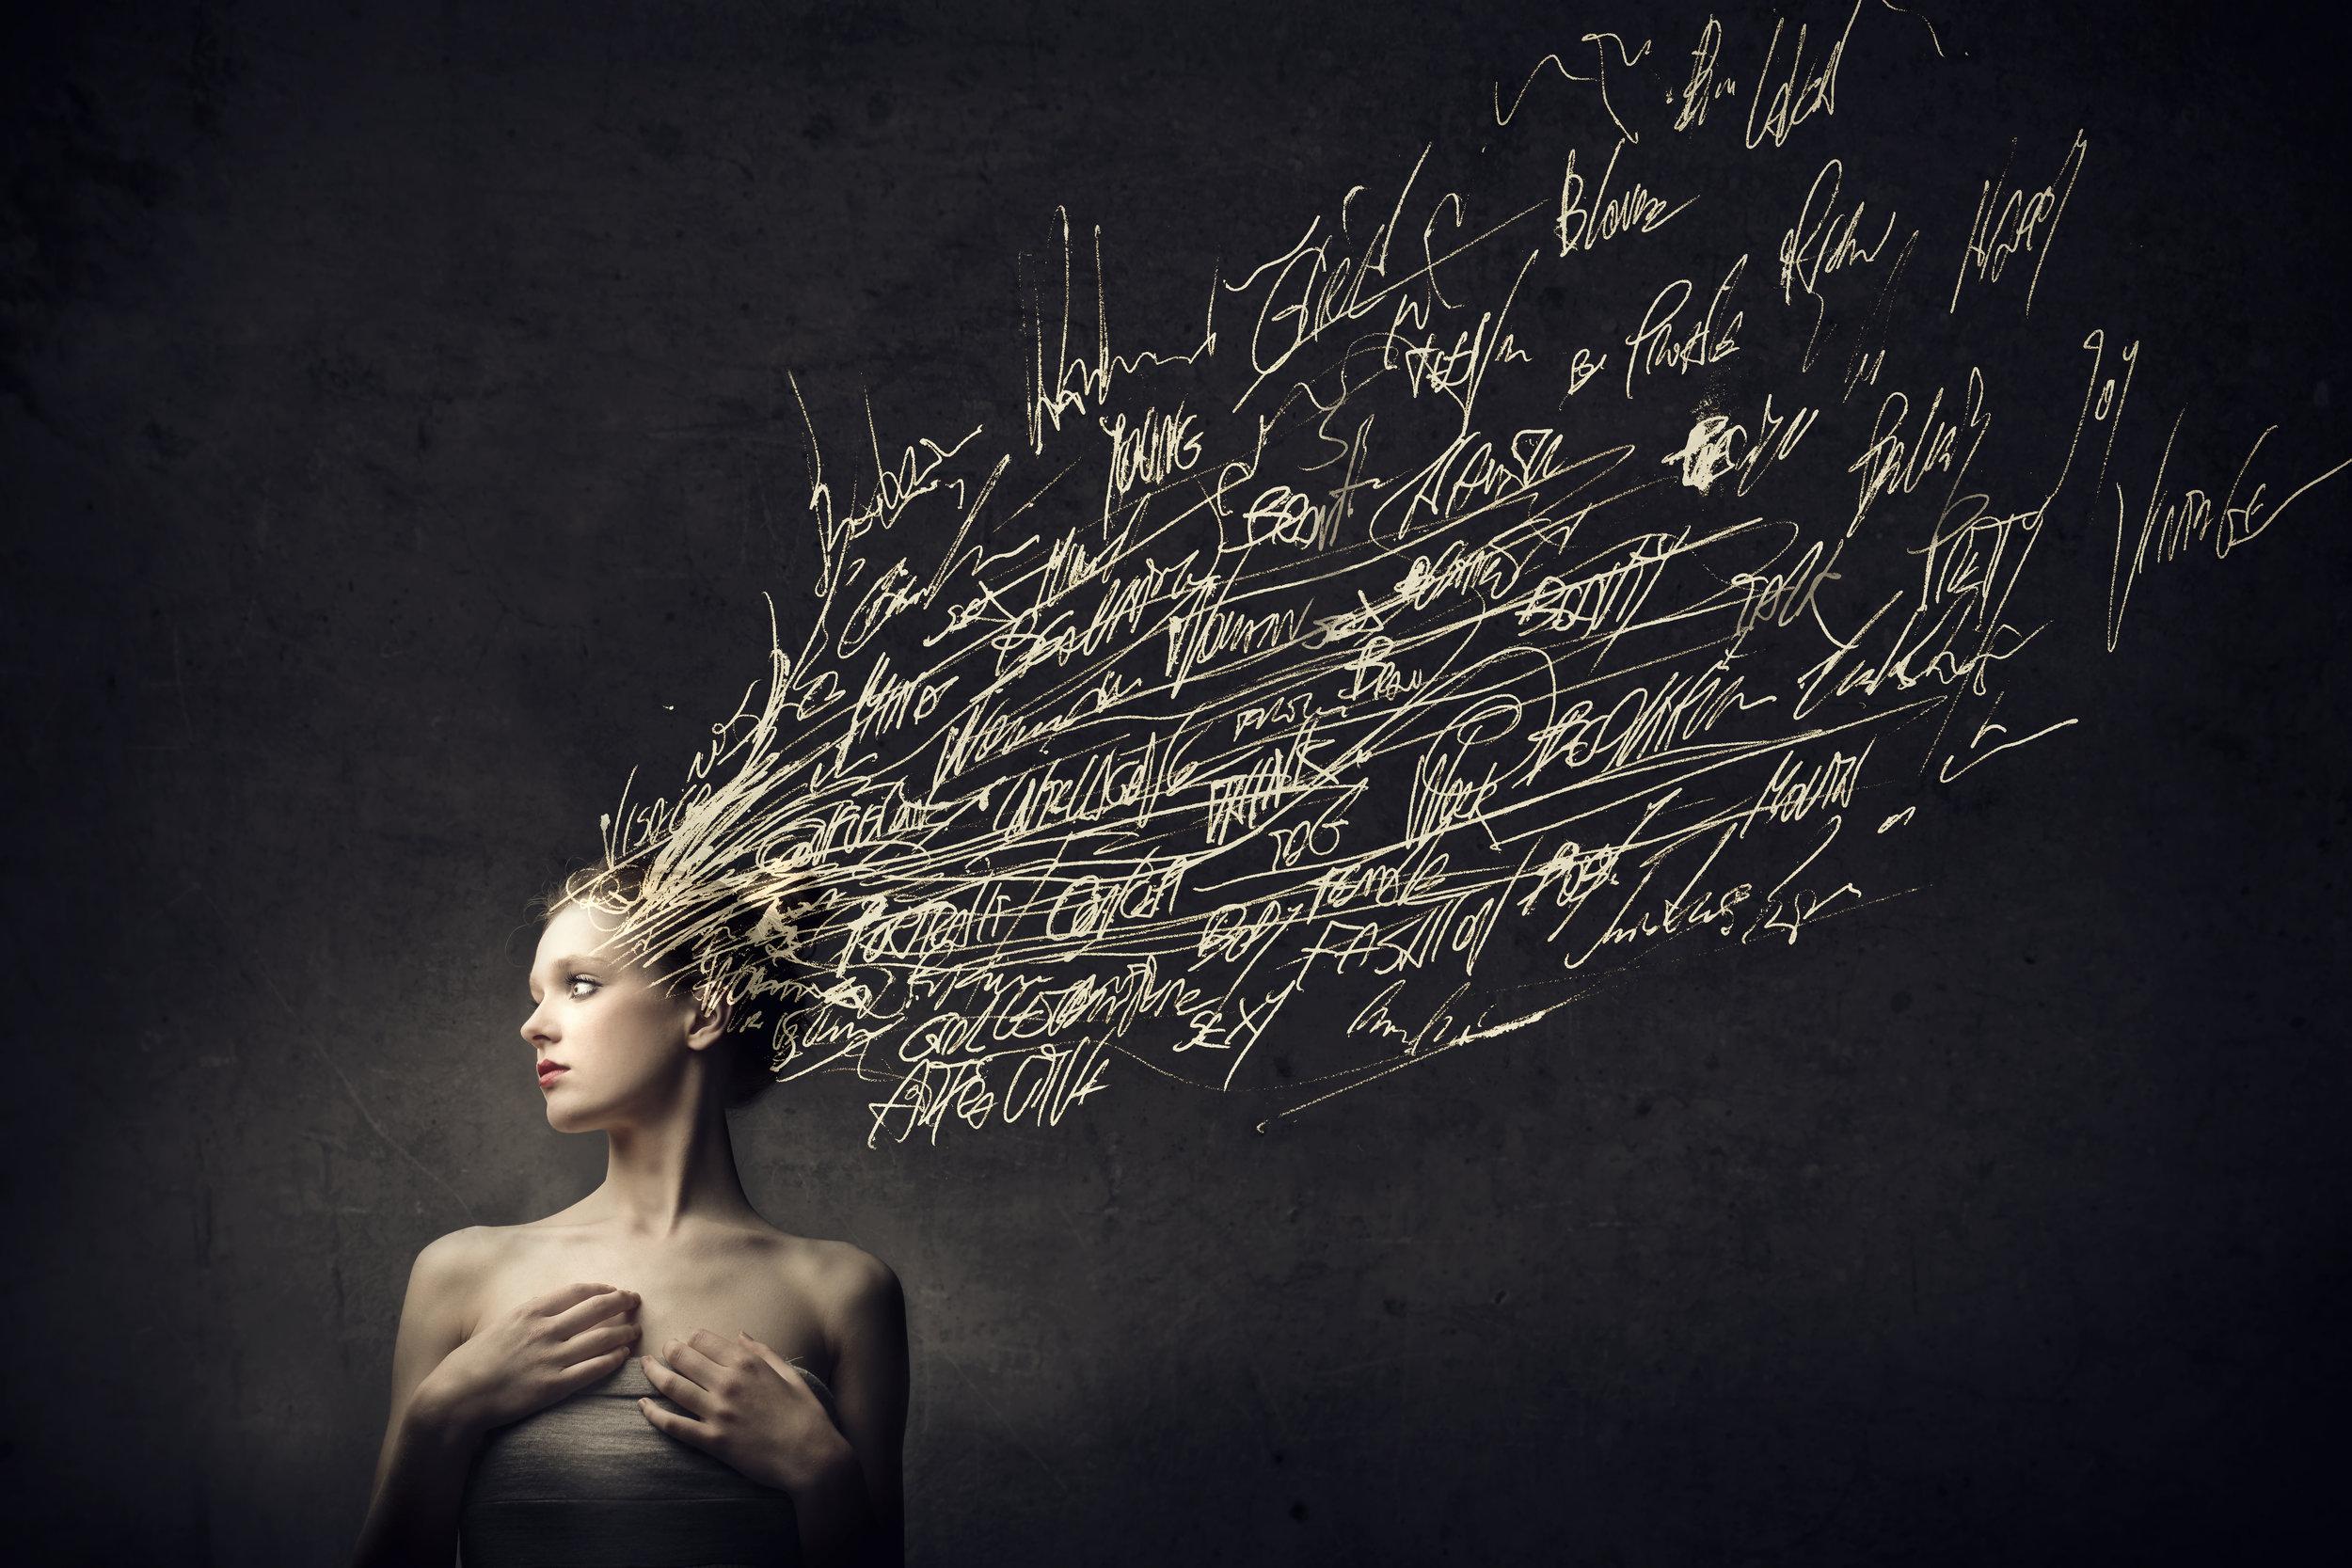 Tangled mind